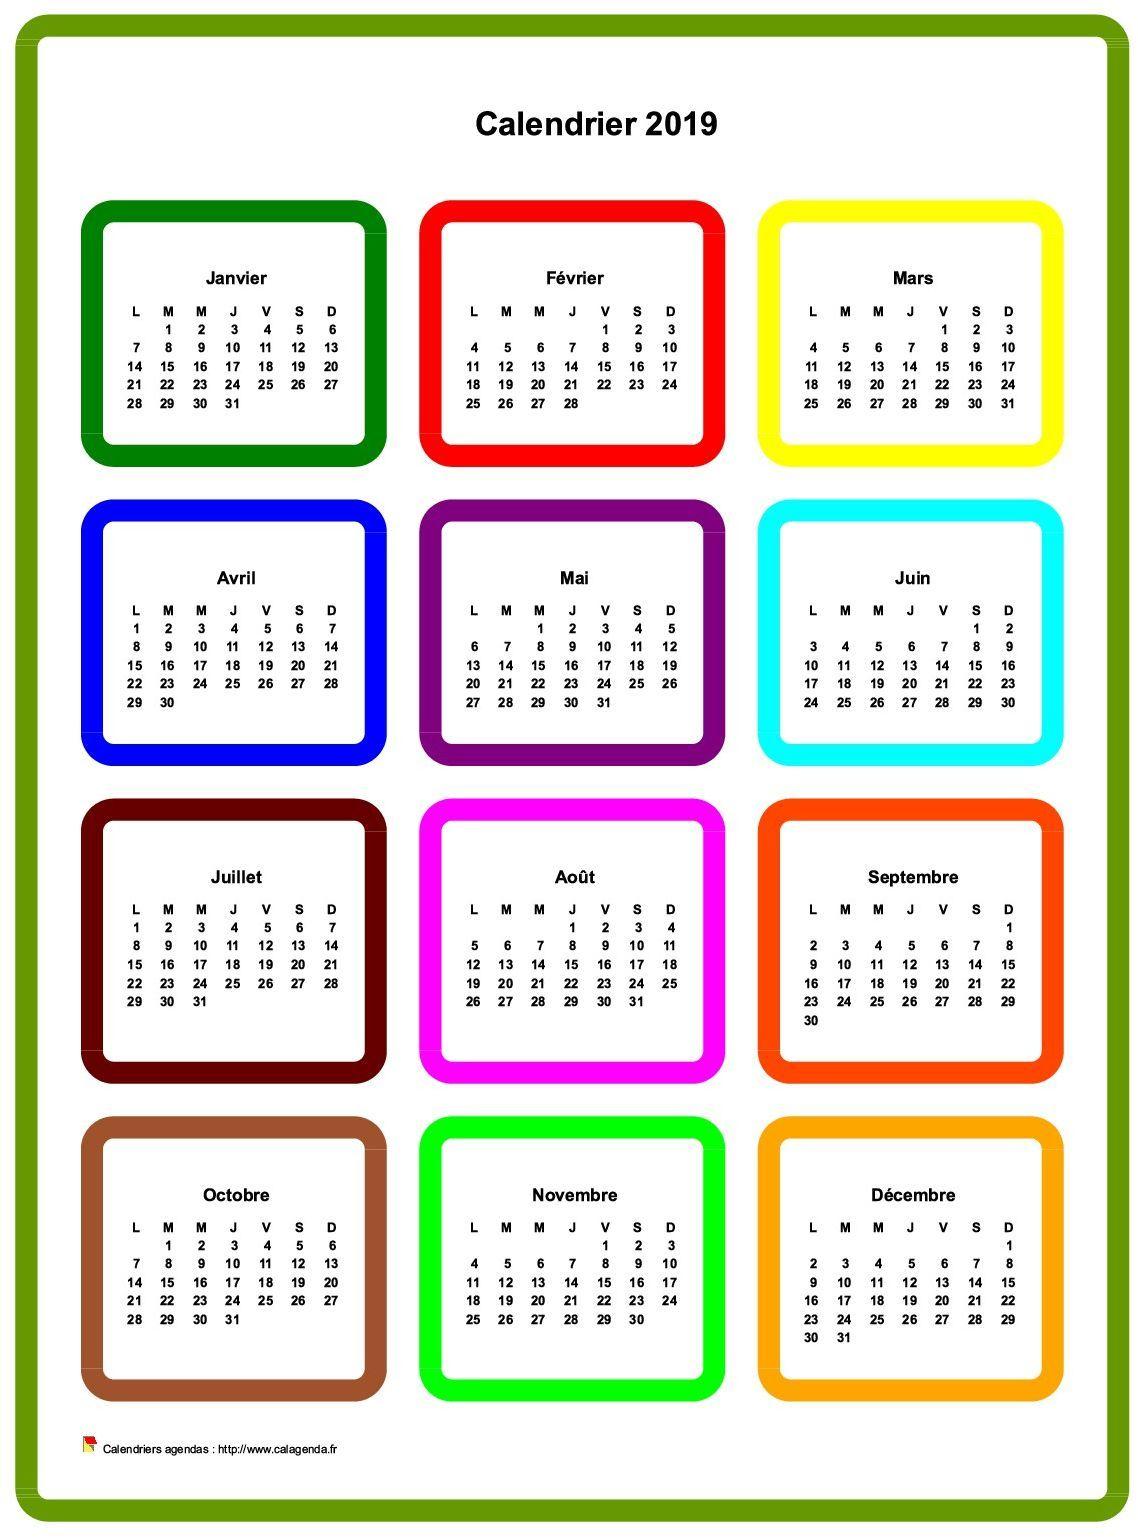 Calendrier 2019 annuel en couleurs | CAL 2019 | Calendar ...